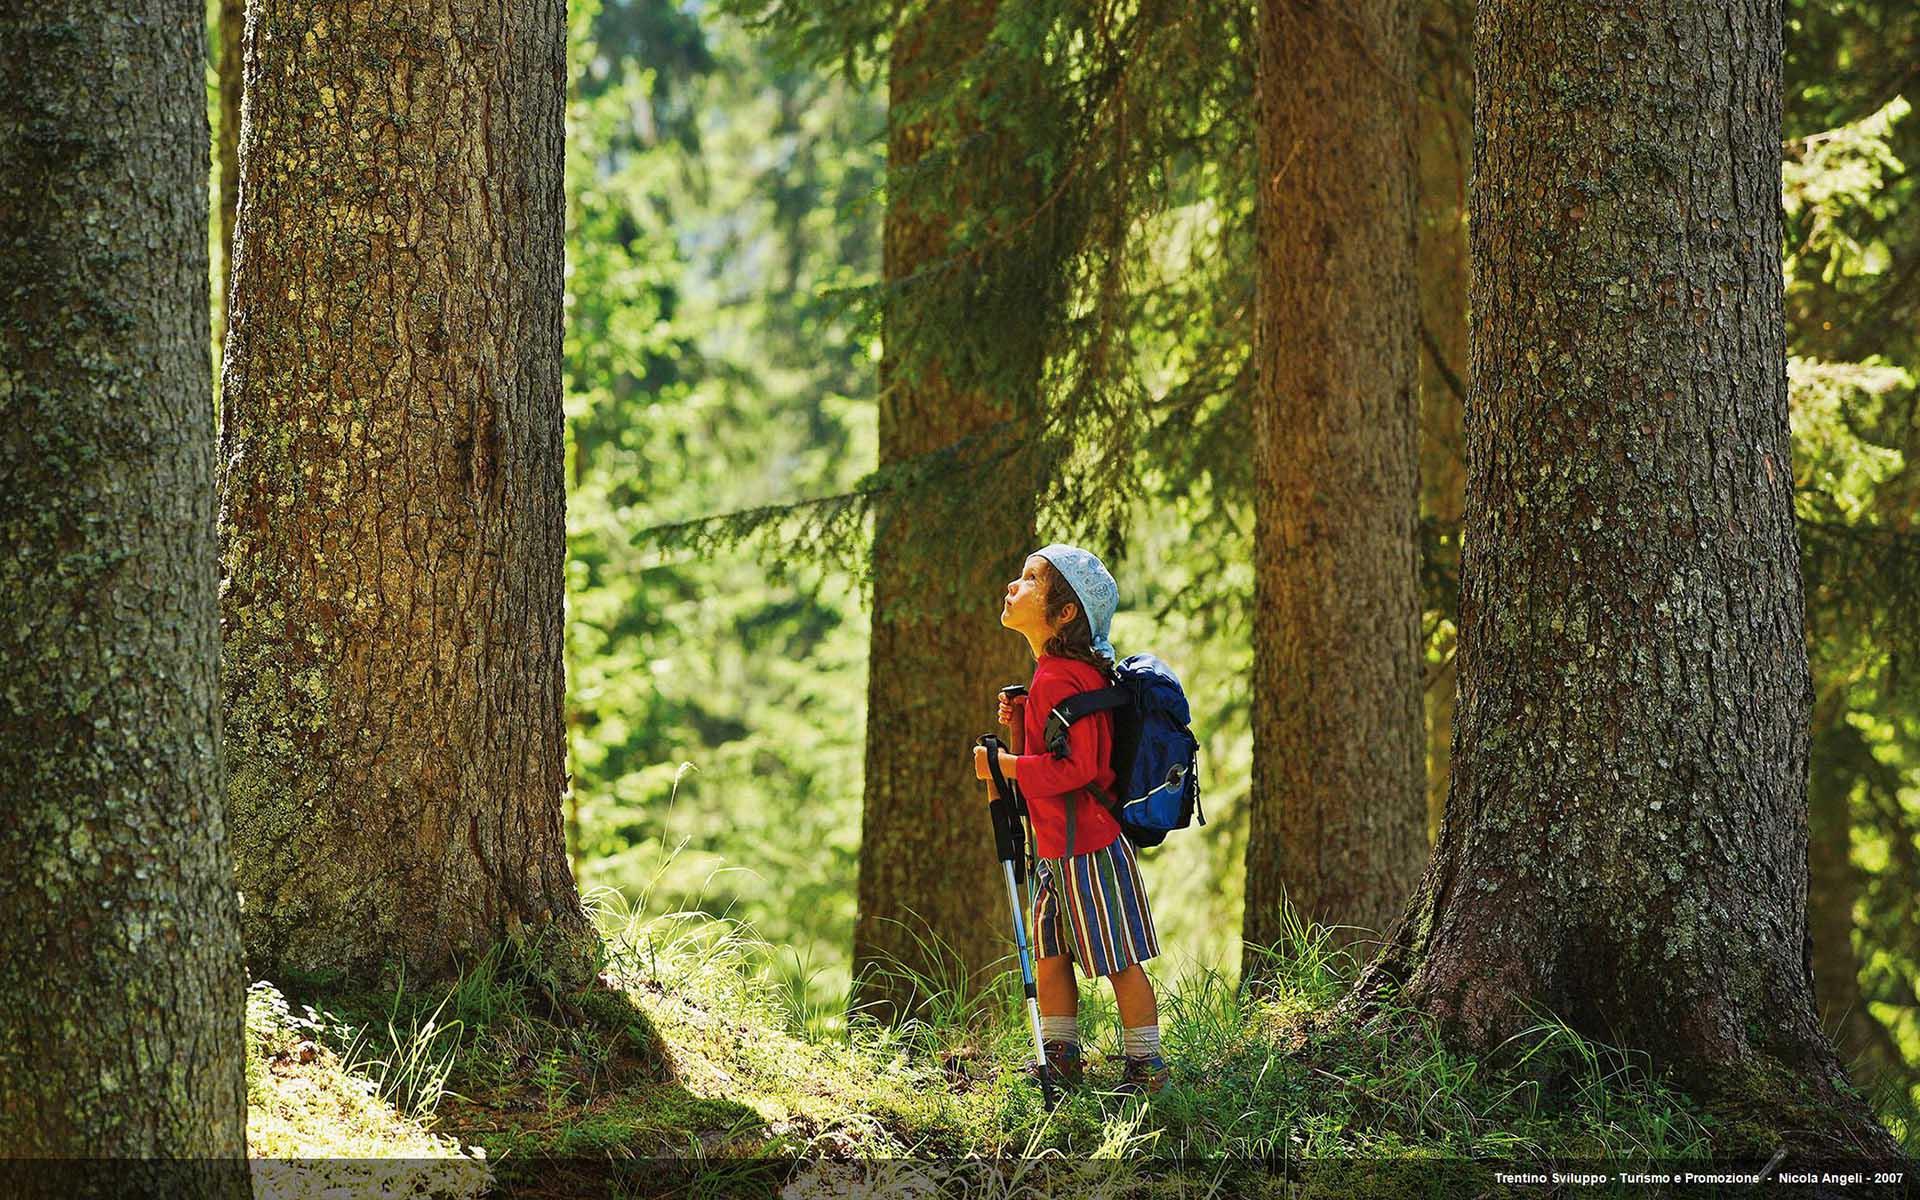 Bambino in mezzo al bosco